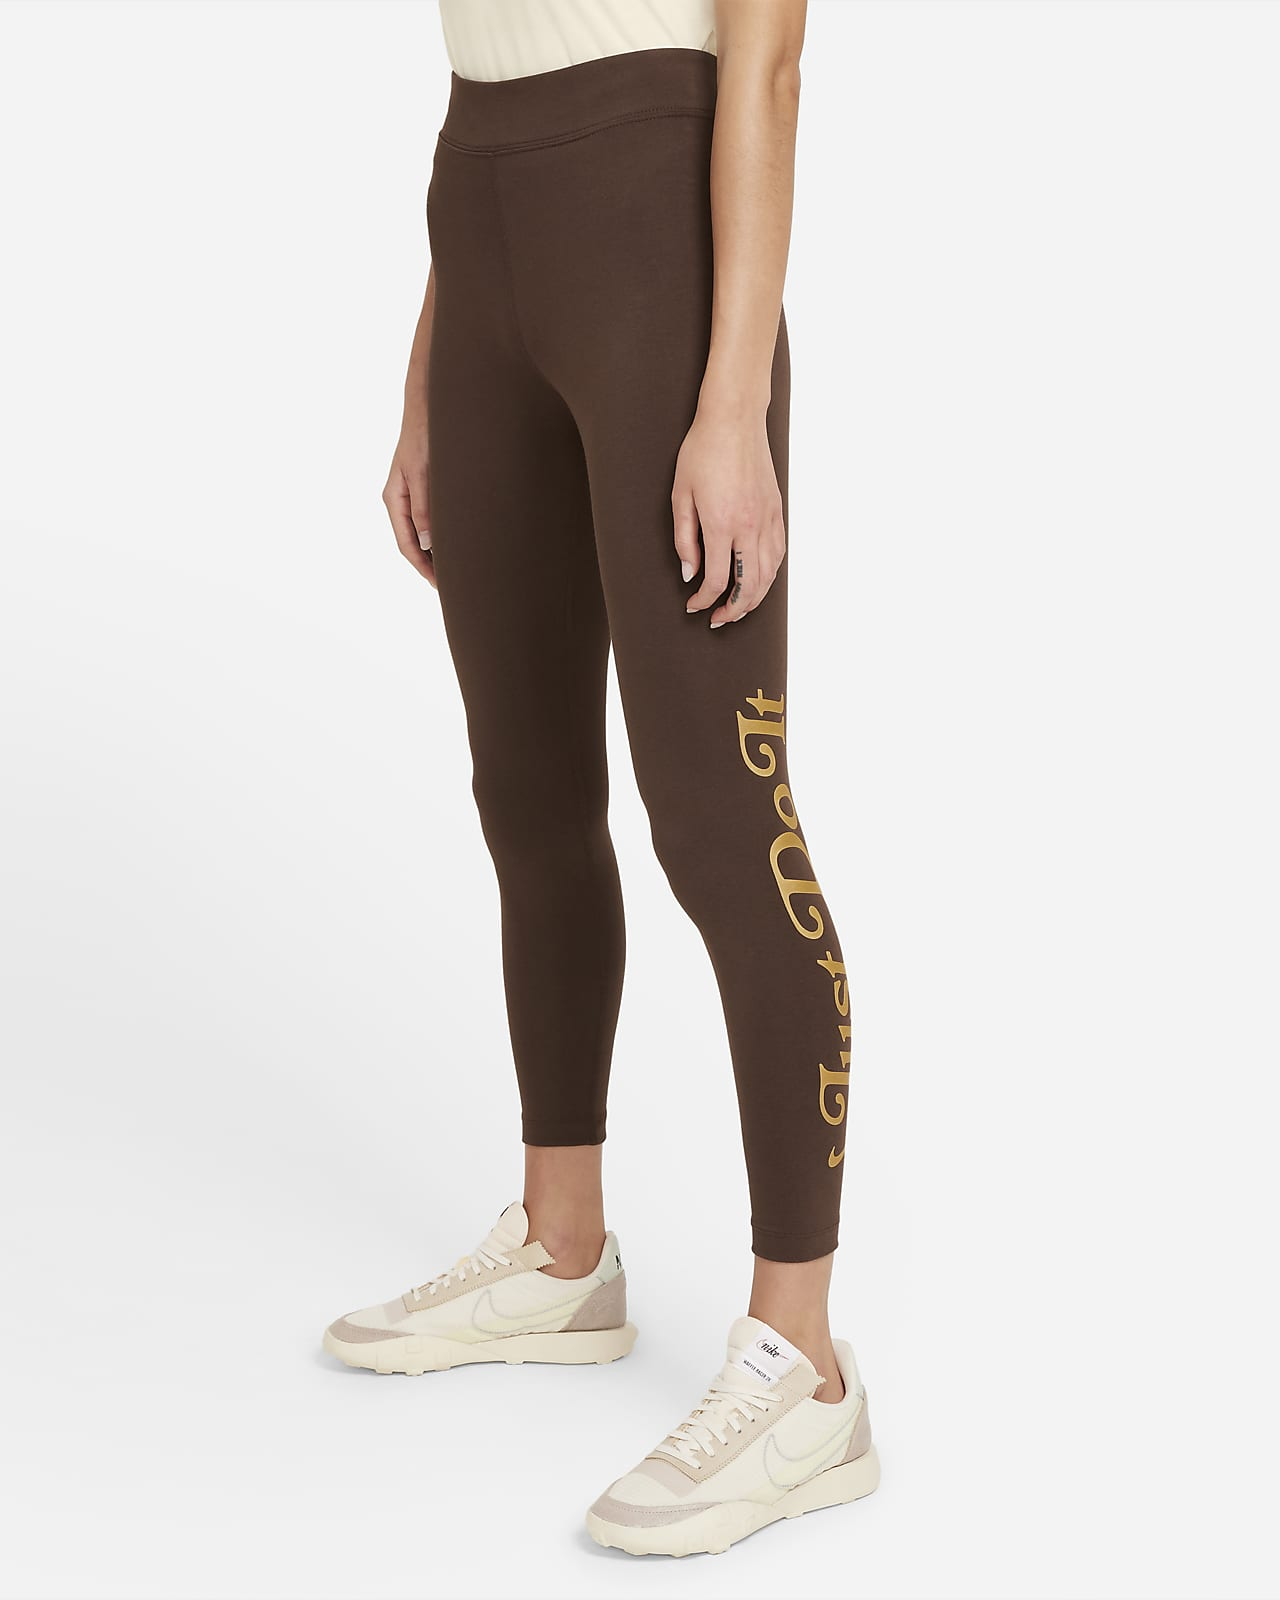 Nike Sportswear Femme 女款高腰內搭褲